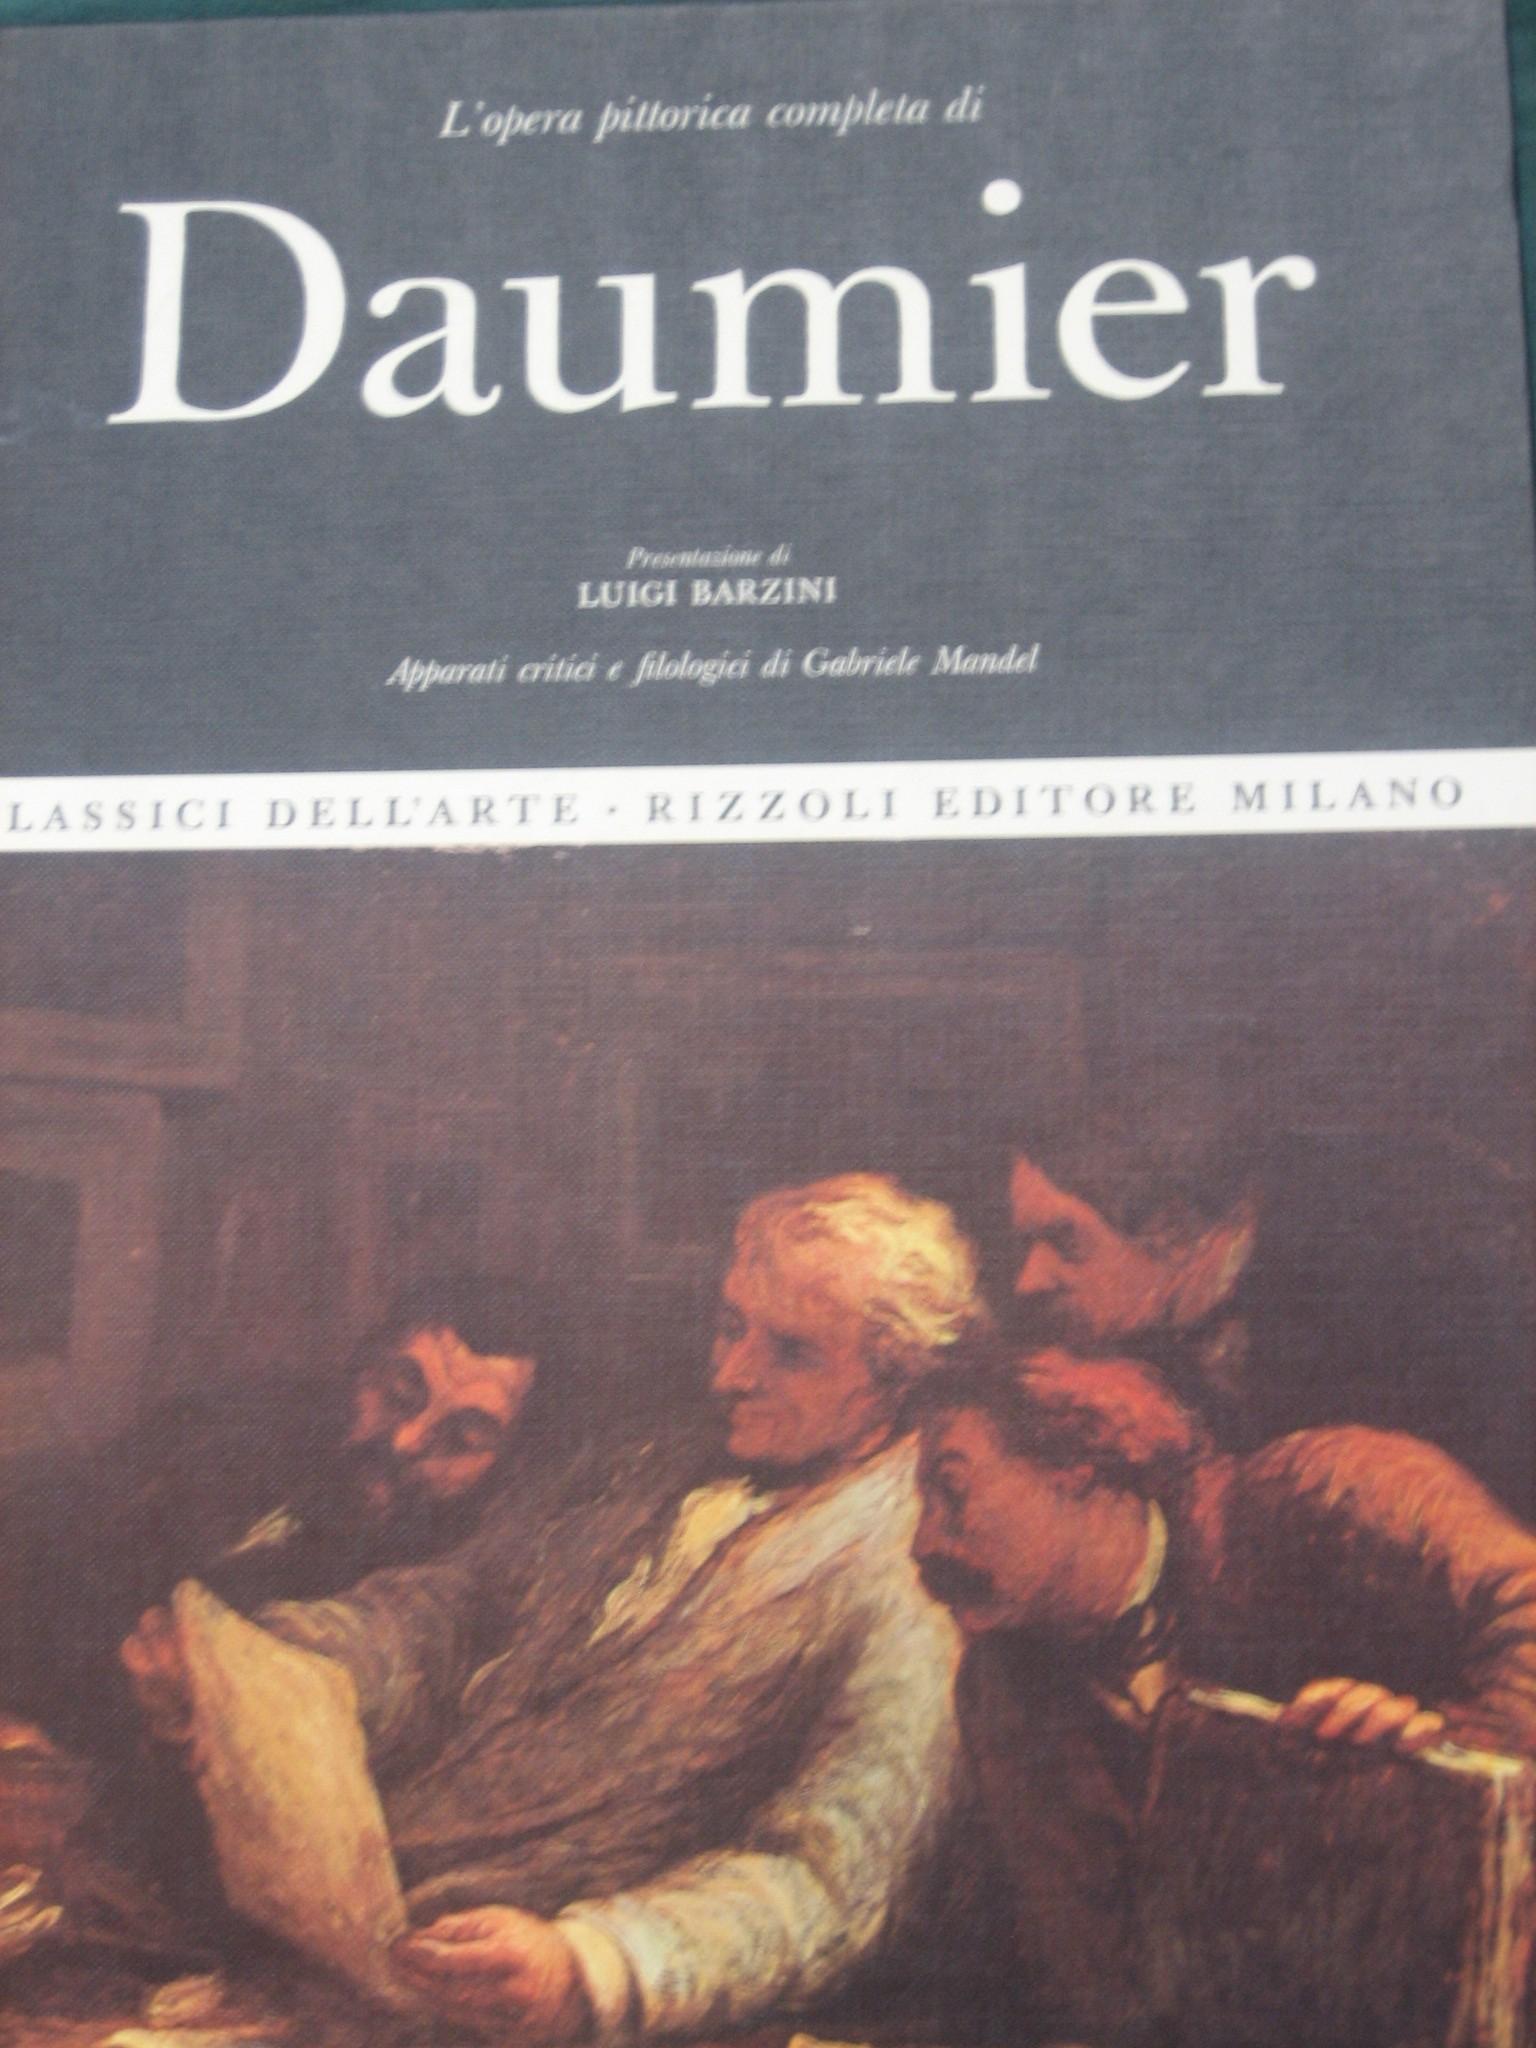 L'opera pittorica completa di Daumier